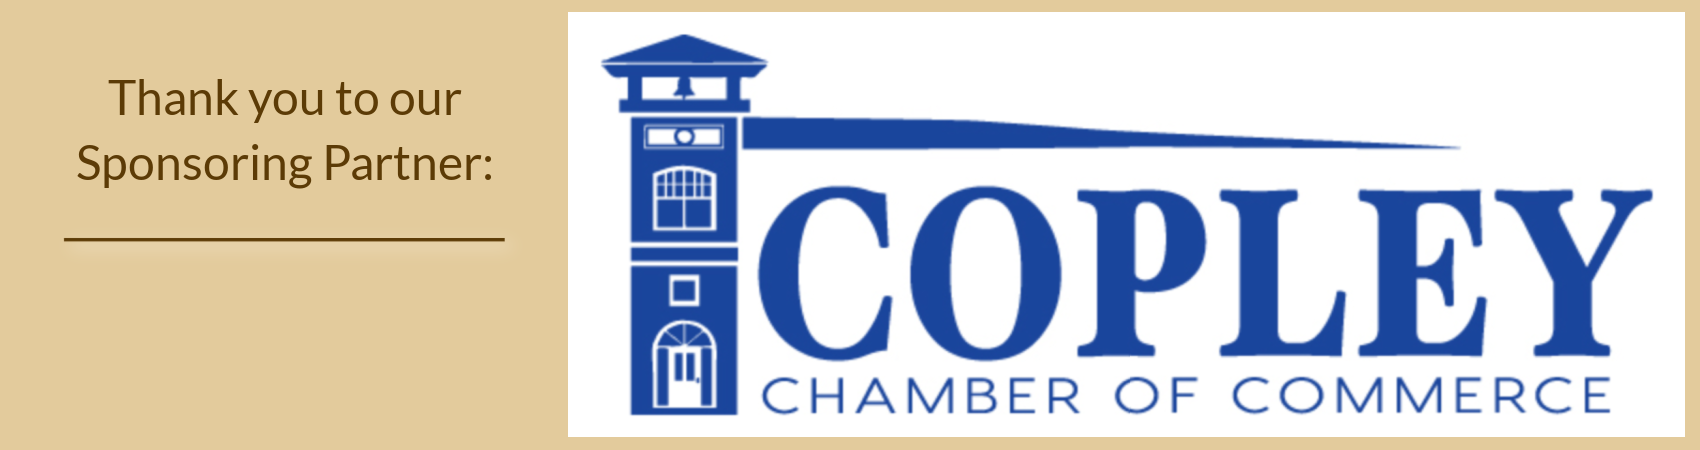 Copley Chamber Sponsoring Partner